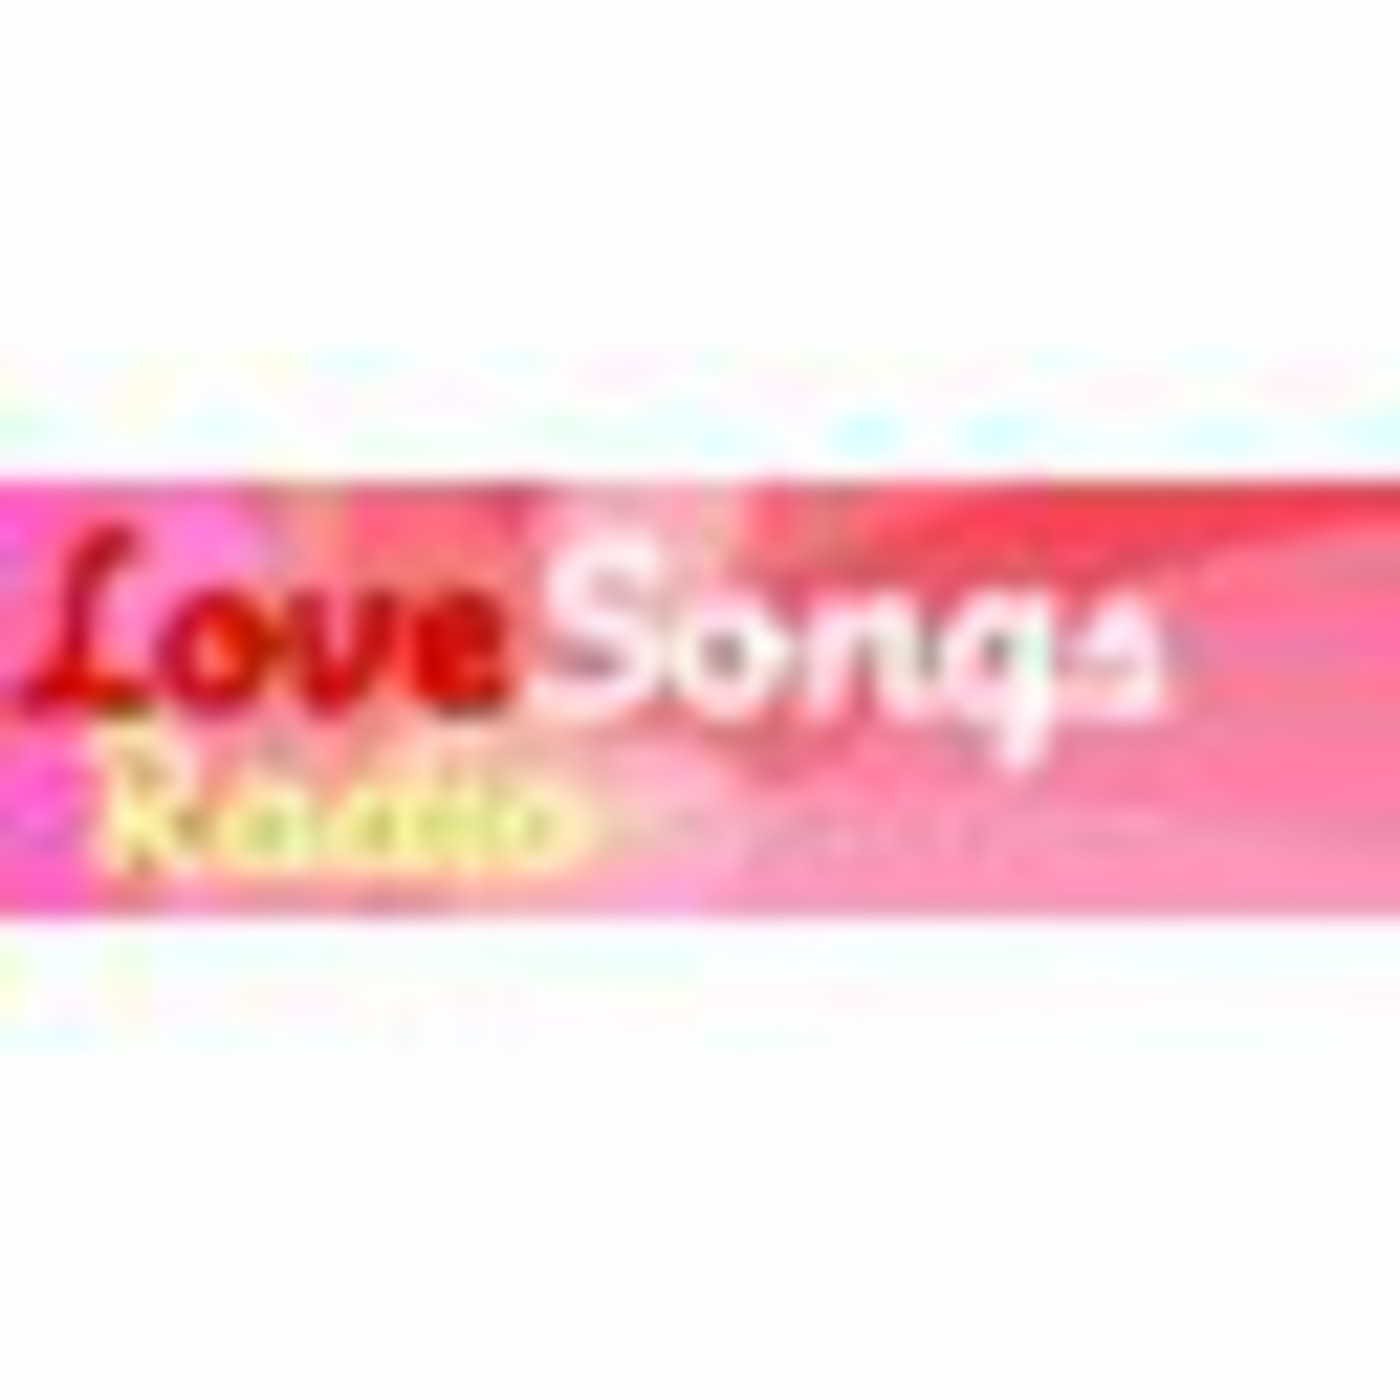 Citaten Love Radio : Love songs radio online ivoox